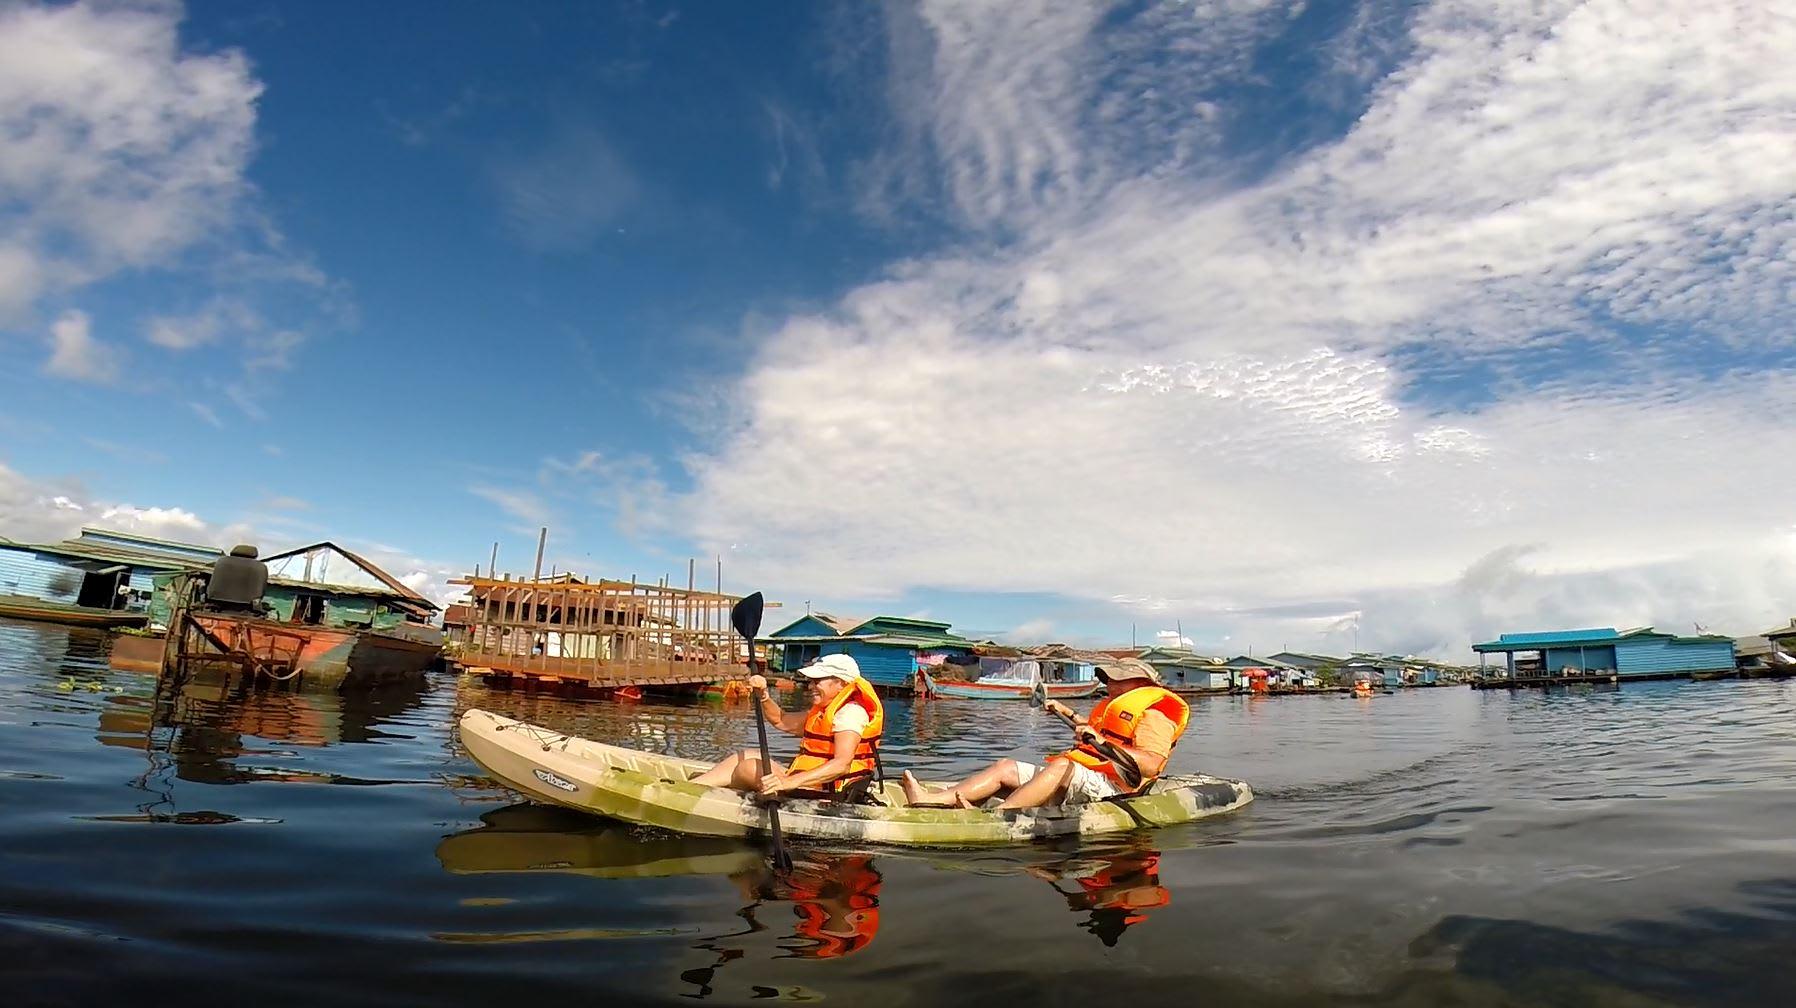 Aqua Mekong's 4-Day Mekong Discovery Upstream Day Three - Kayaking